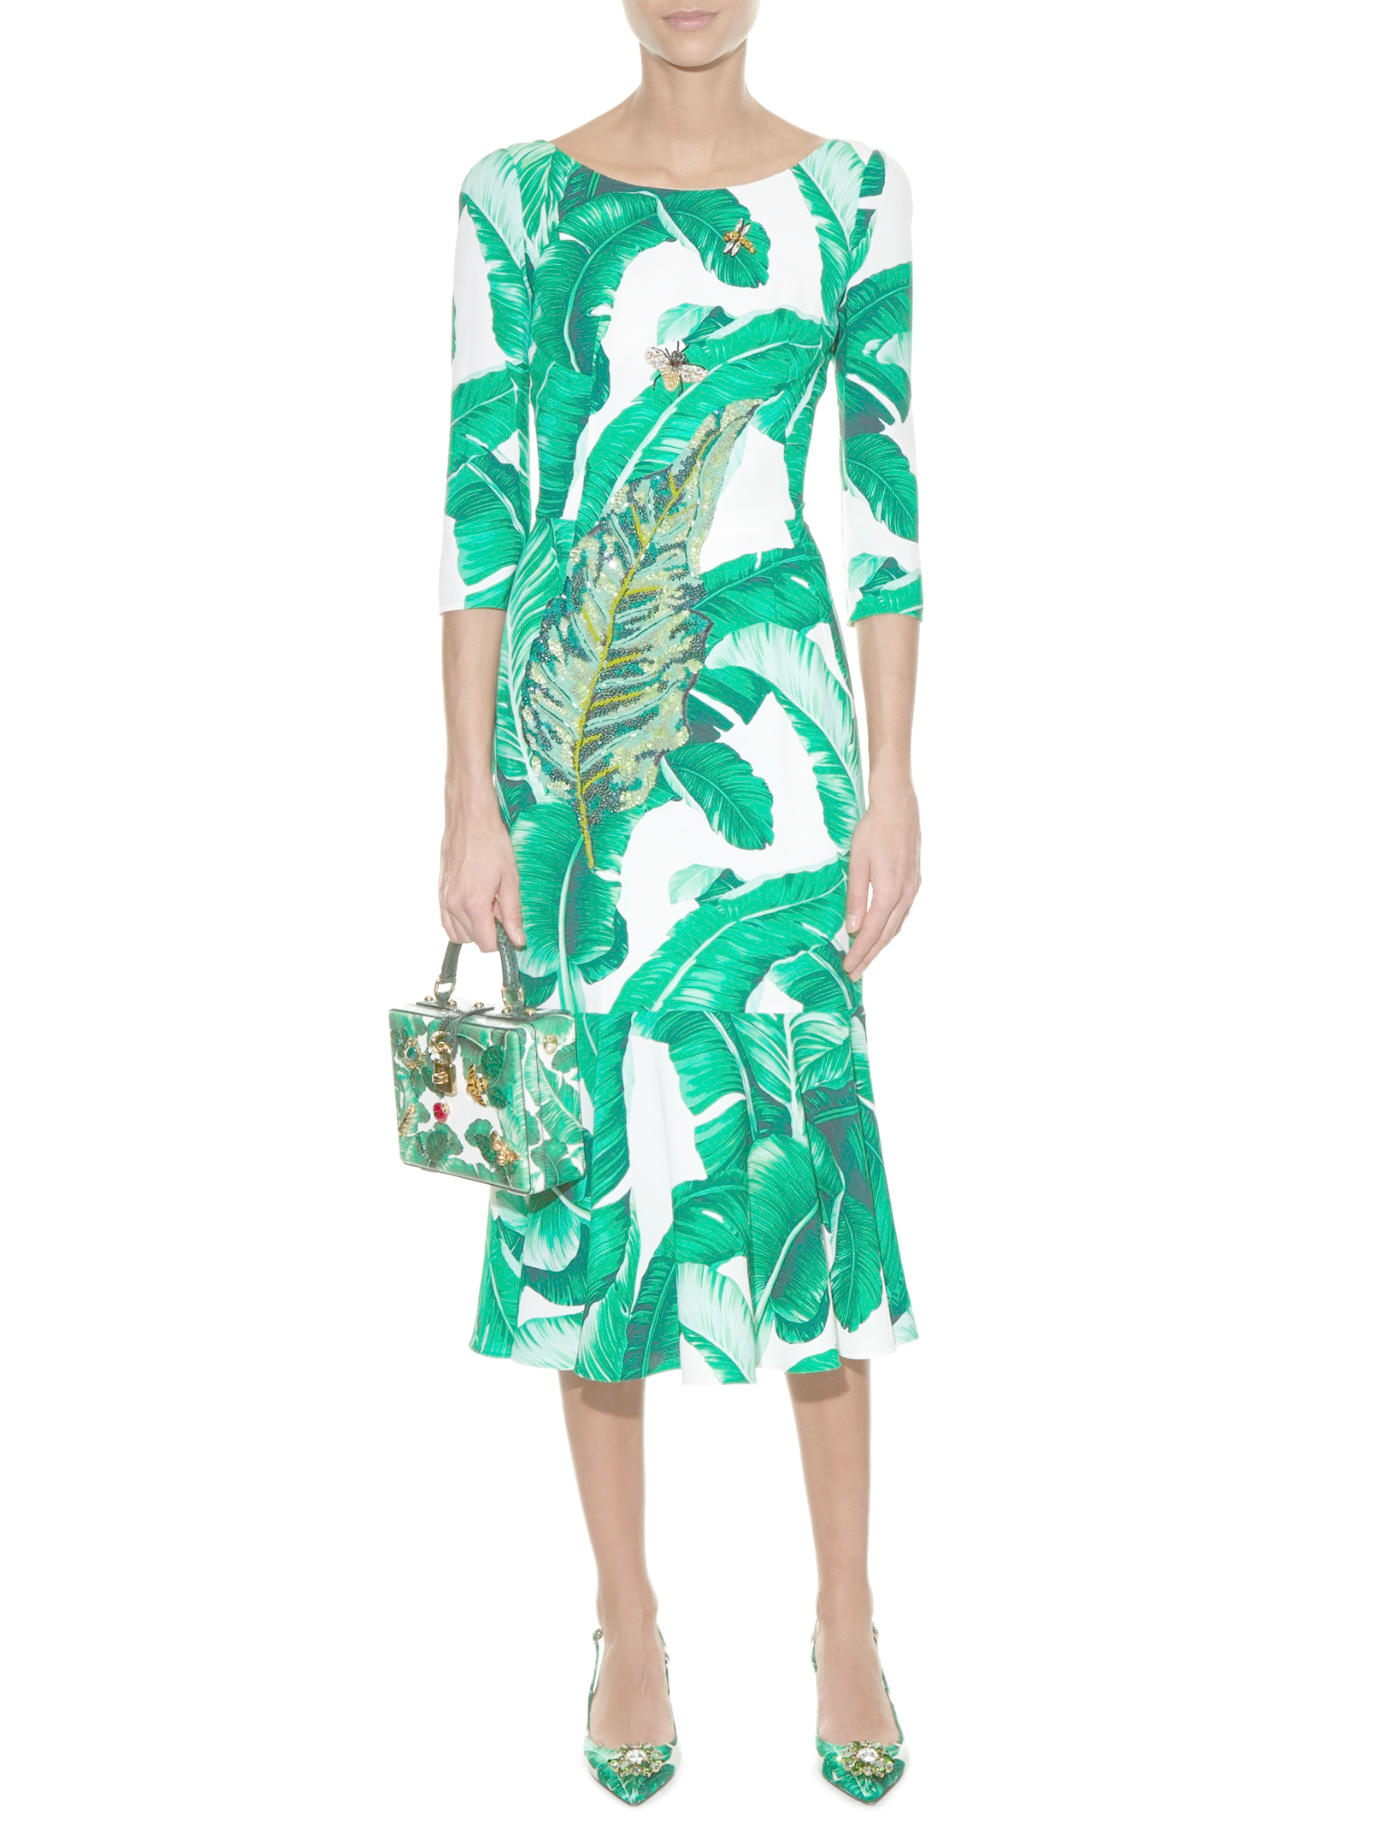 ab947893038f9 Lyst - Dolce   Gabbana Banana Leaf-print Embellished Dress in Green